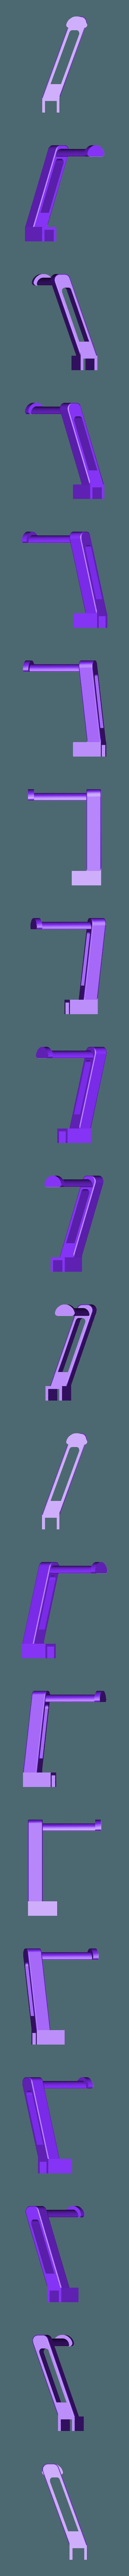 Filament_500g.STL Télécharger fichier STL gratuit Tevo Filament de tarentule • Plan à imprimer en 3D, Gatober